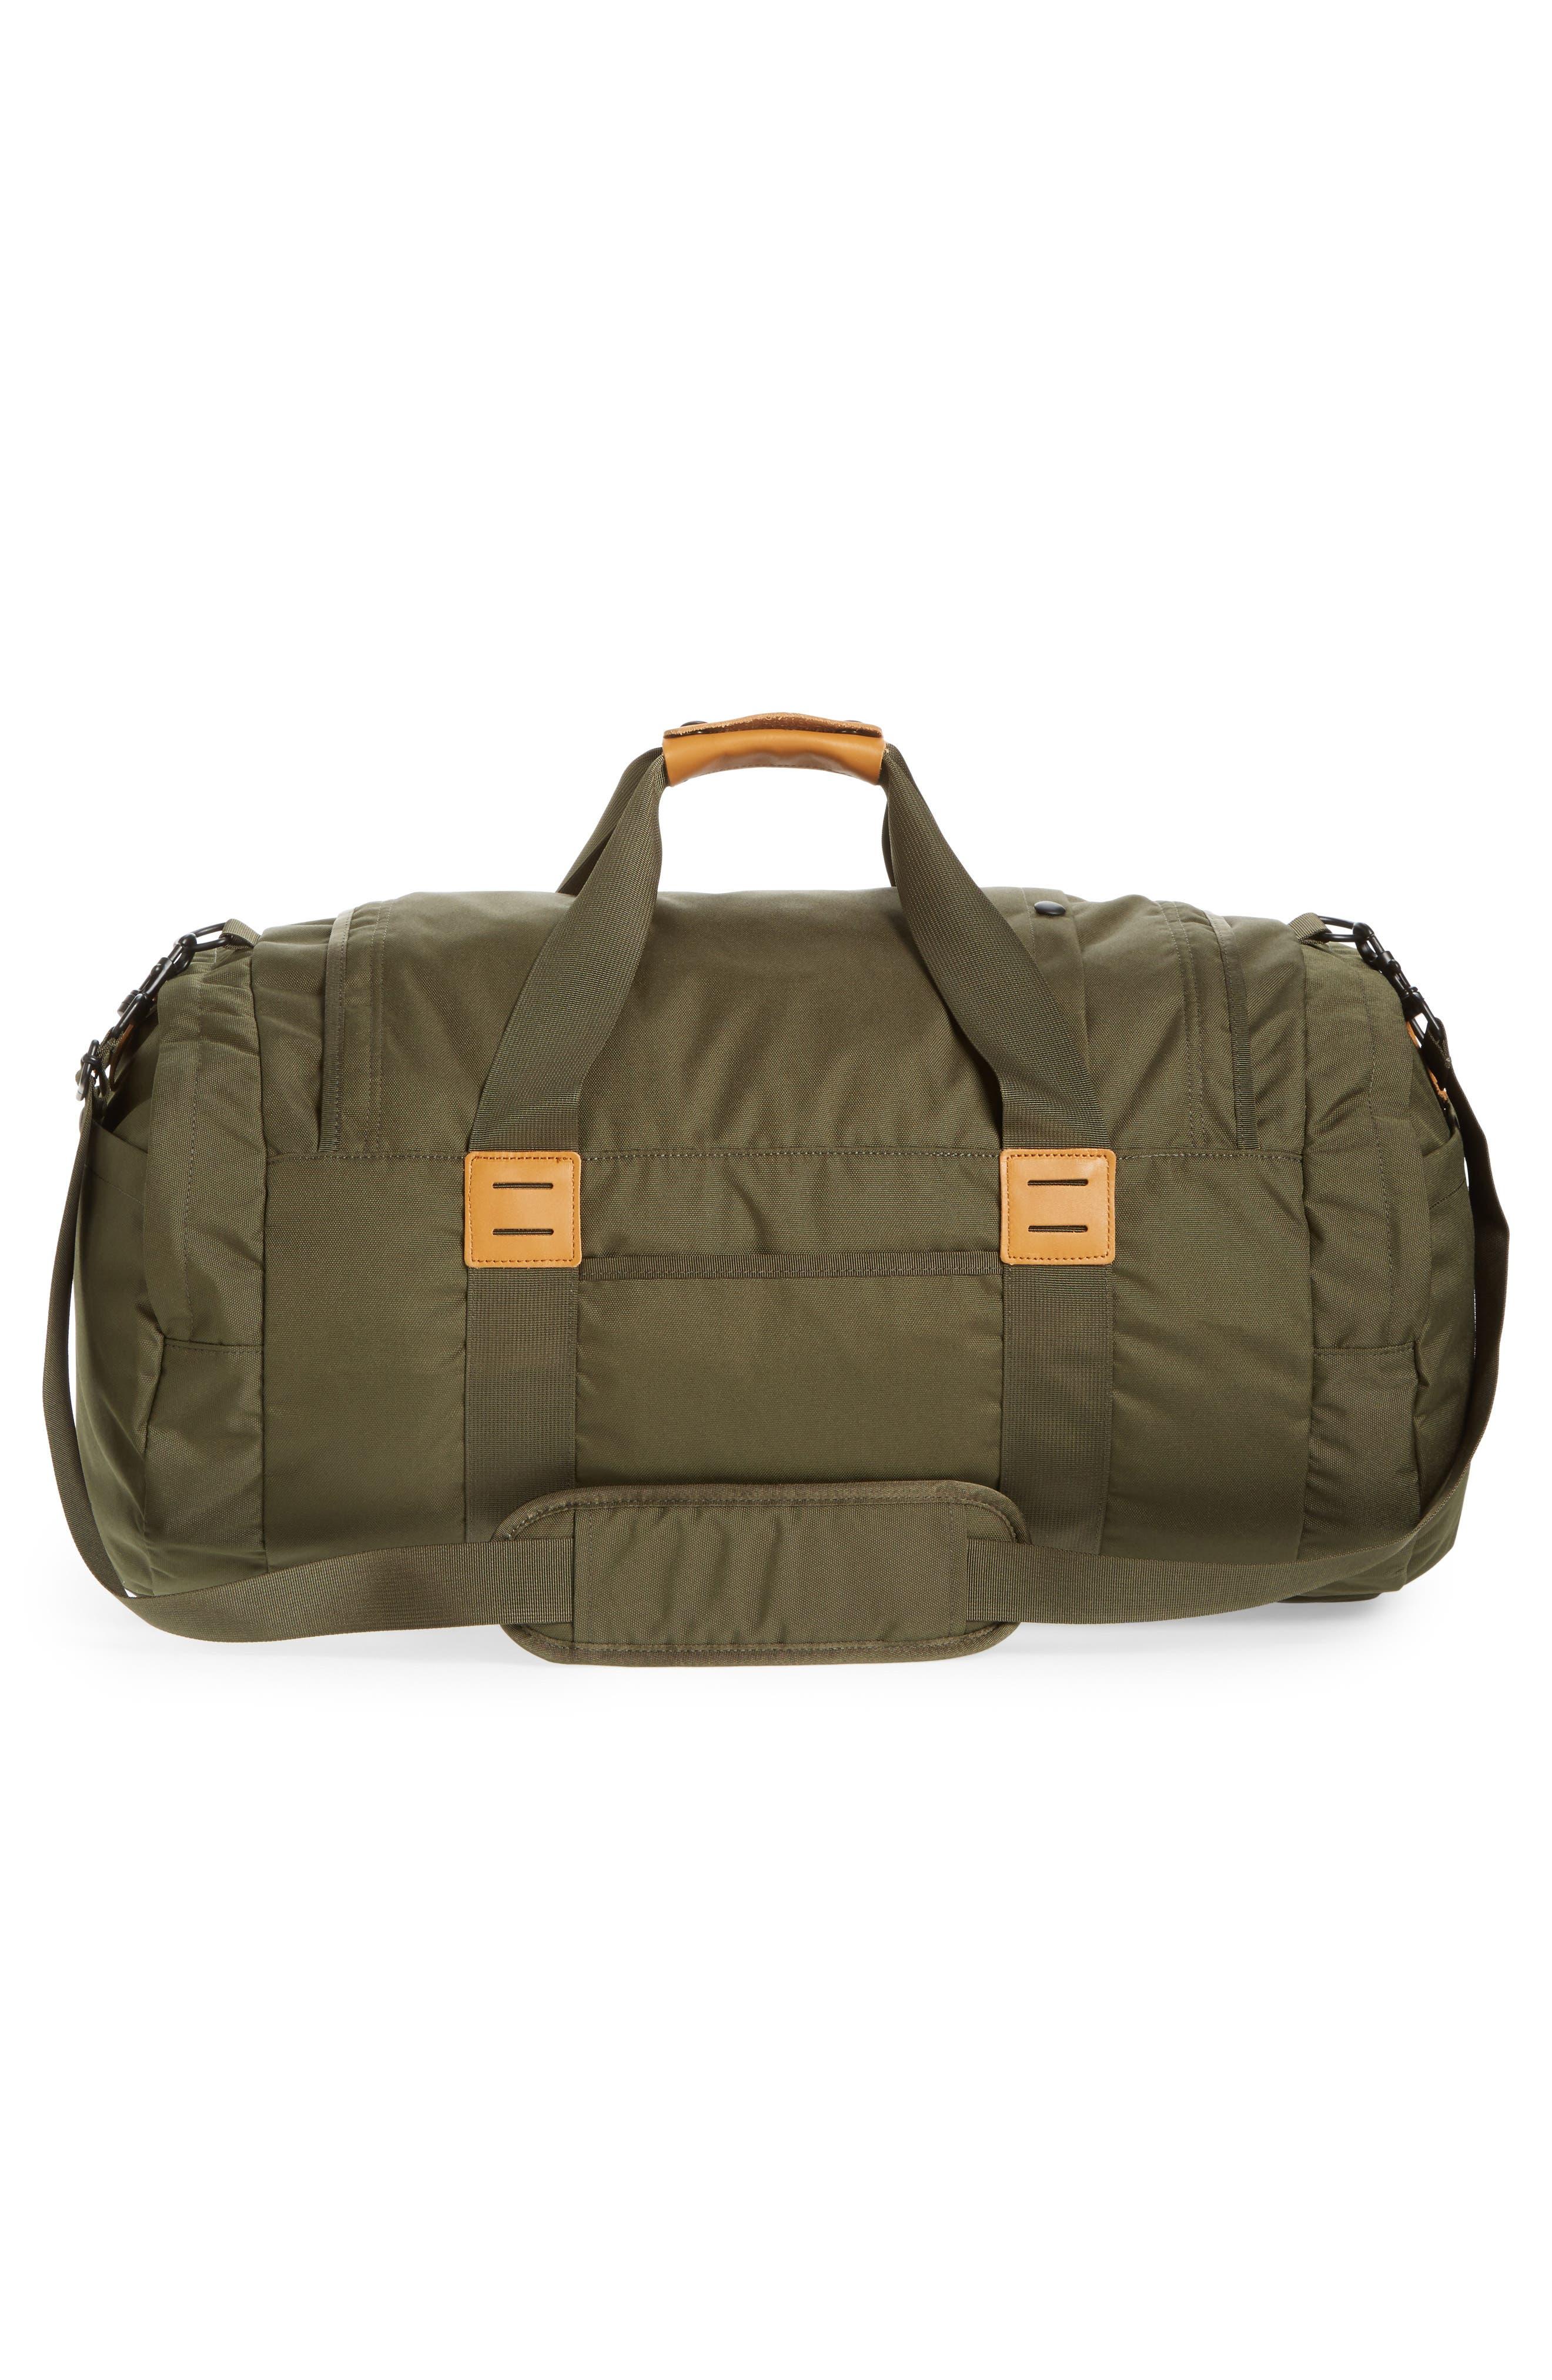 Arc Duffel Bag,                             Alternate thumbnail 3, color,                             Olive